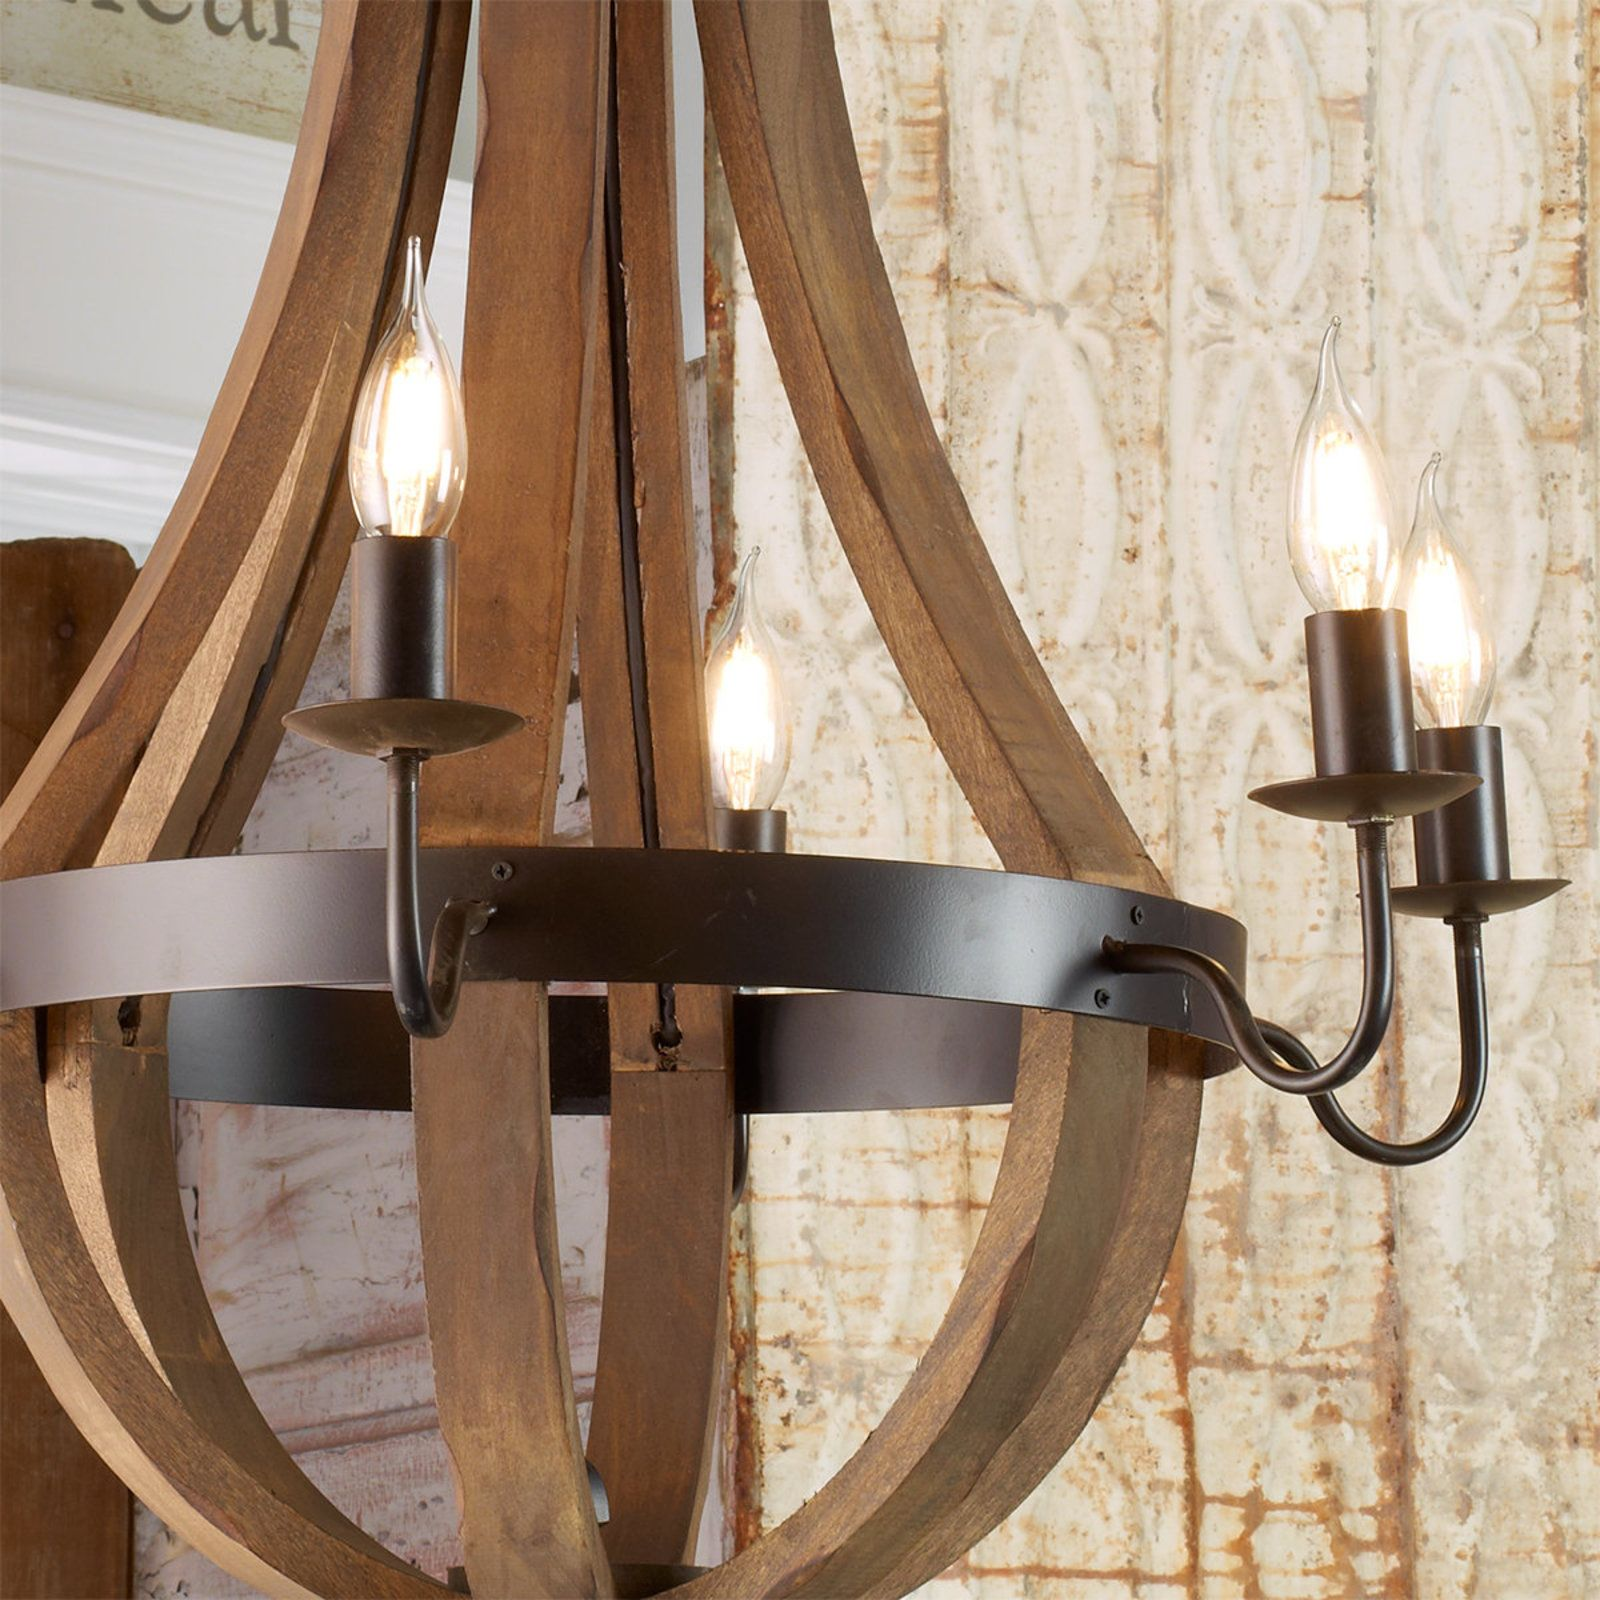 Wooden wine barrel stave chandelier wine barrel chandelier wooden wine barrel stave chandelier arubaitofo Gallery